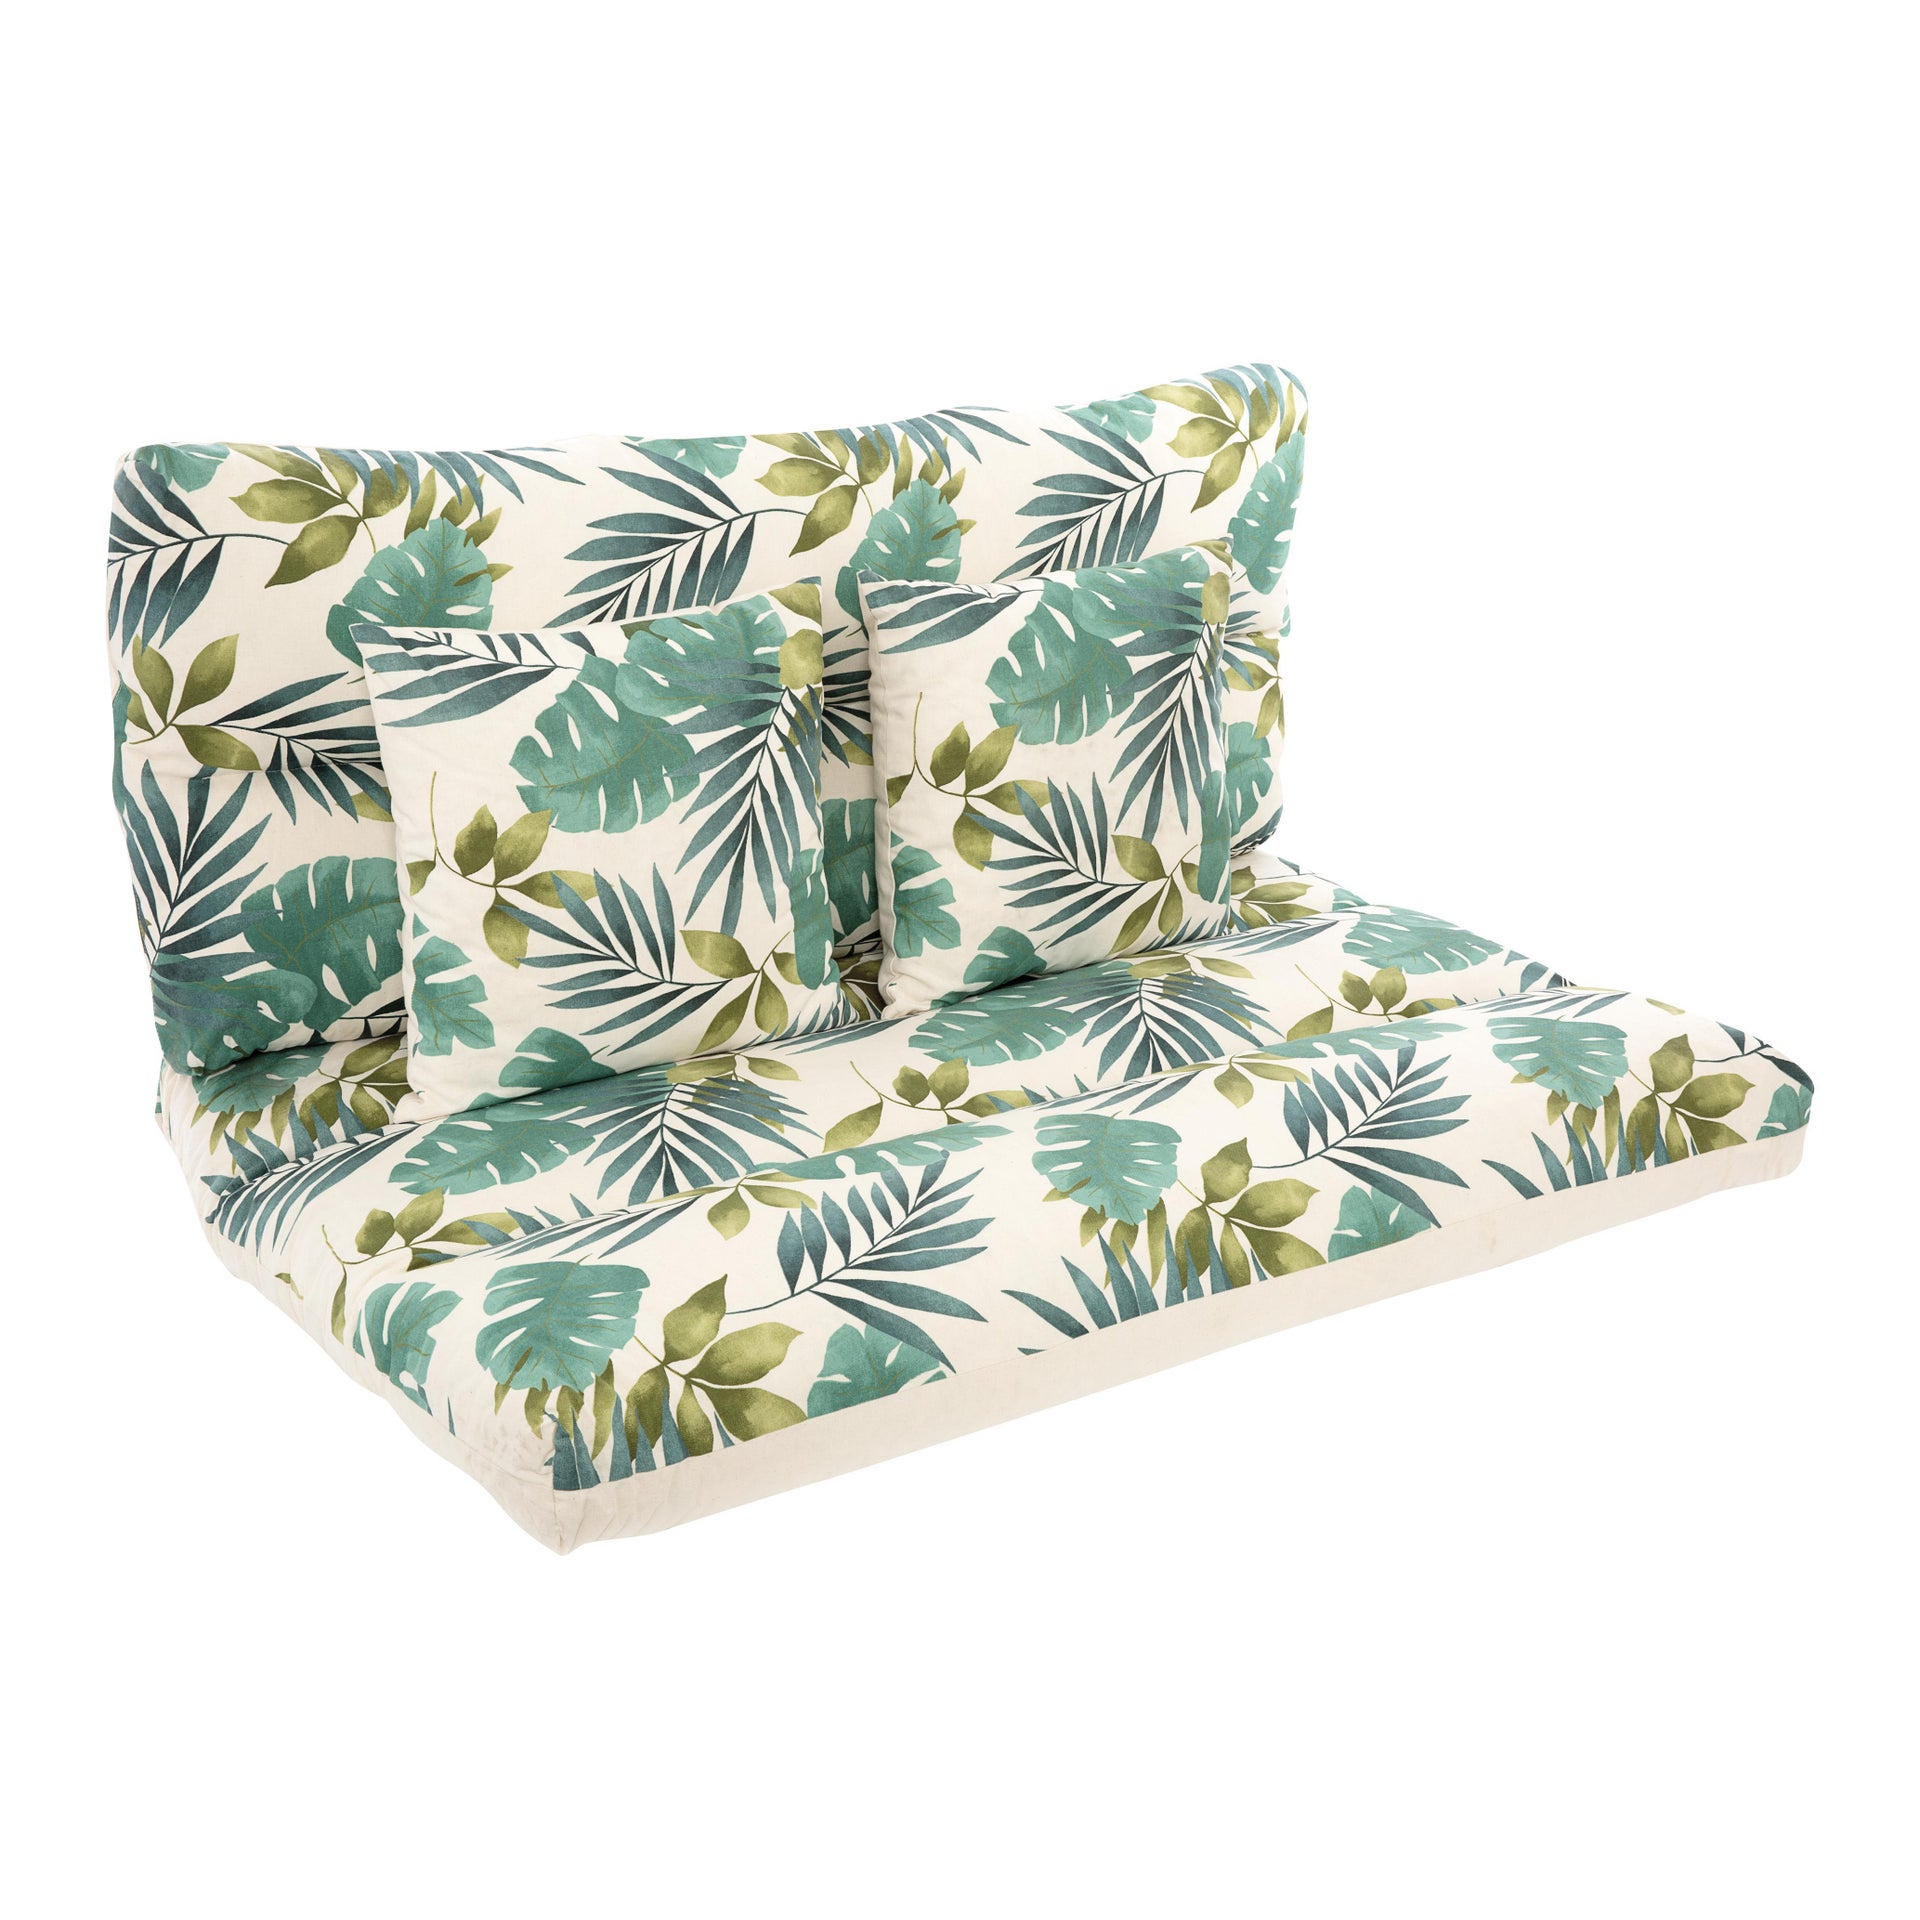 Cuscino da esterno BRASILE multicolore 120 x 80 x Sp 80 cm , 4 pezzi - 1